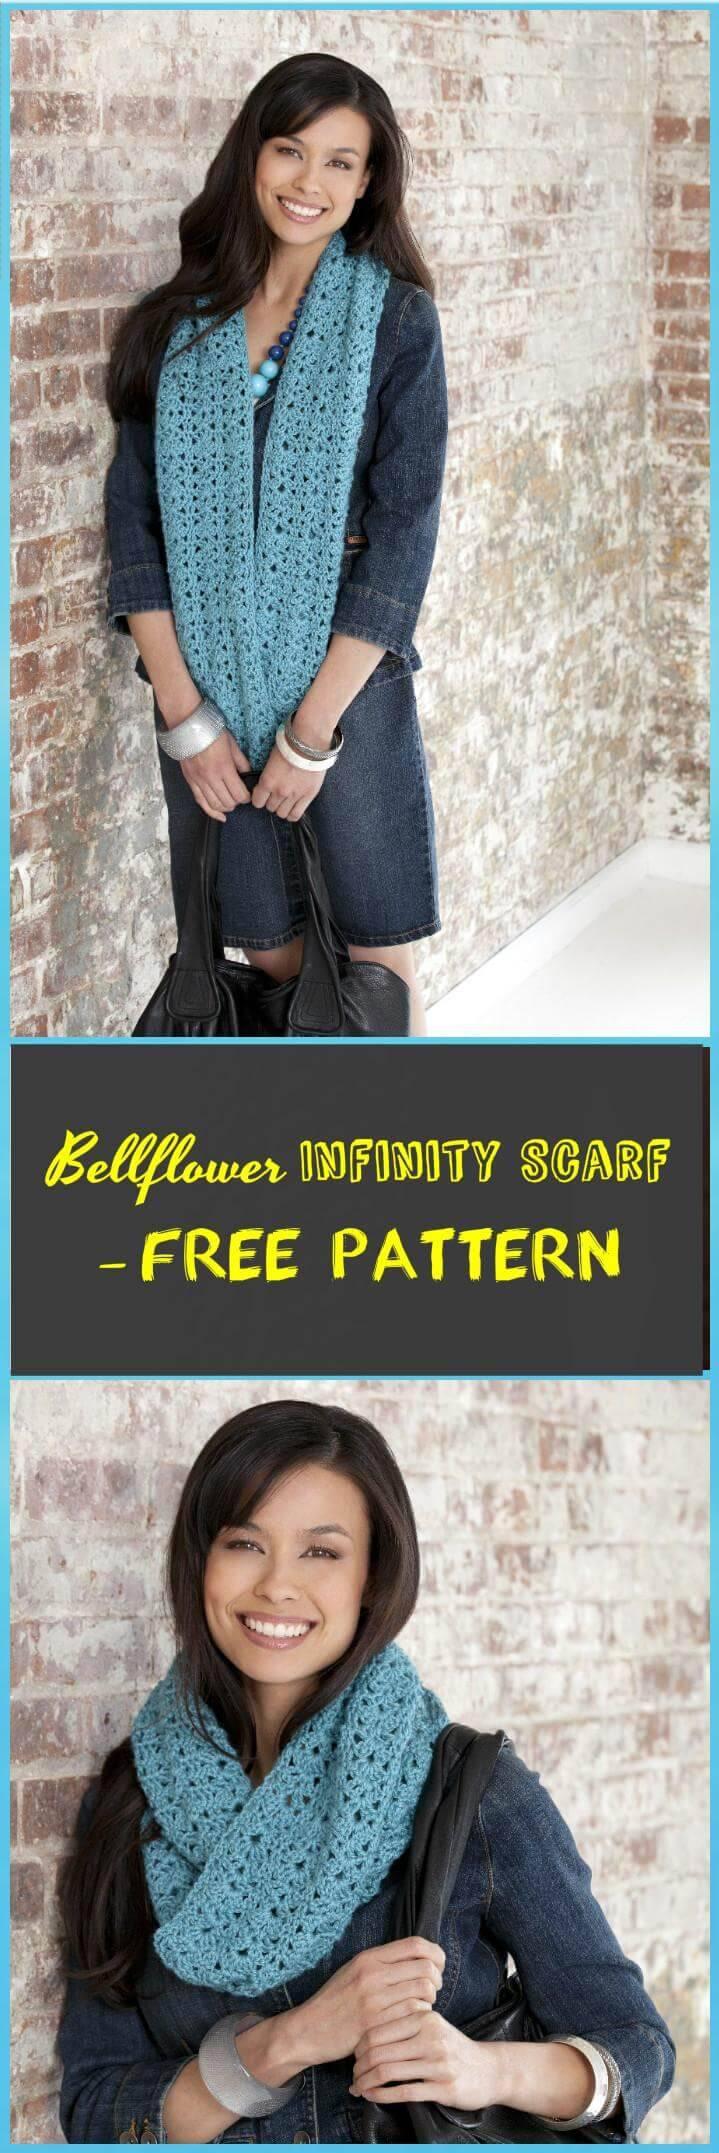 easy bellflower infinity scarf free pattern